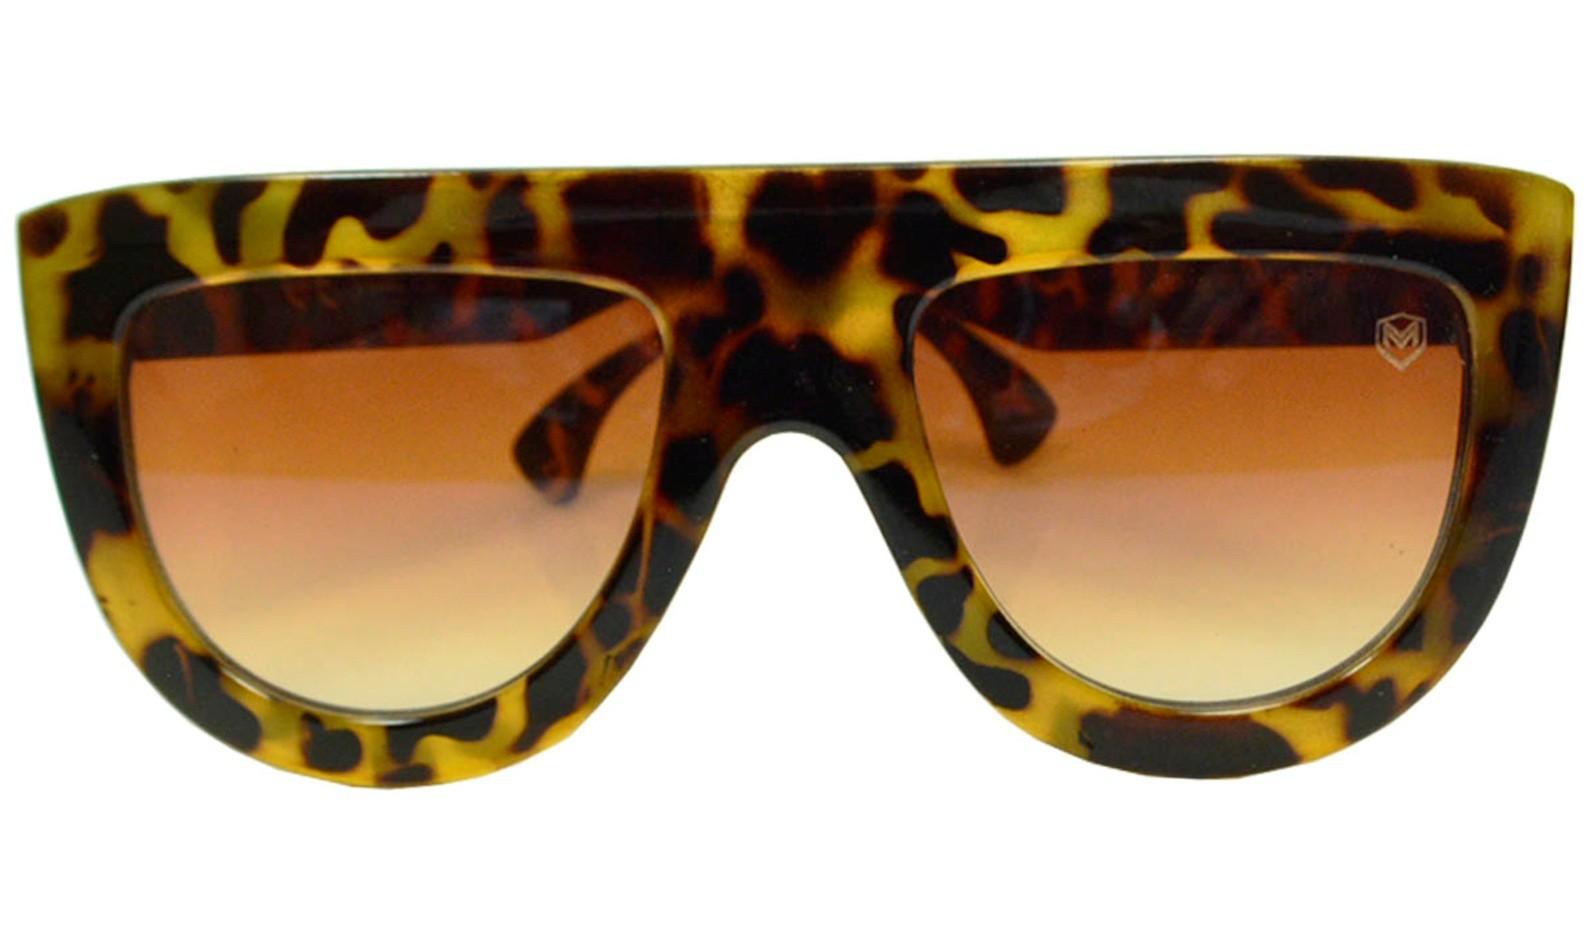 Óculos De Sol Mackage Unissex Acetato Fashion - Tartaruga